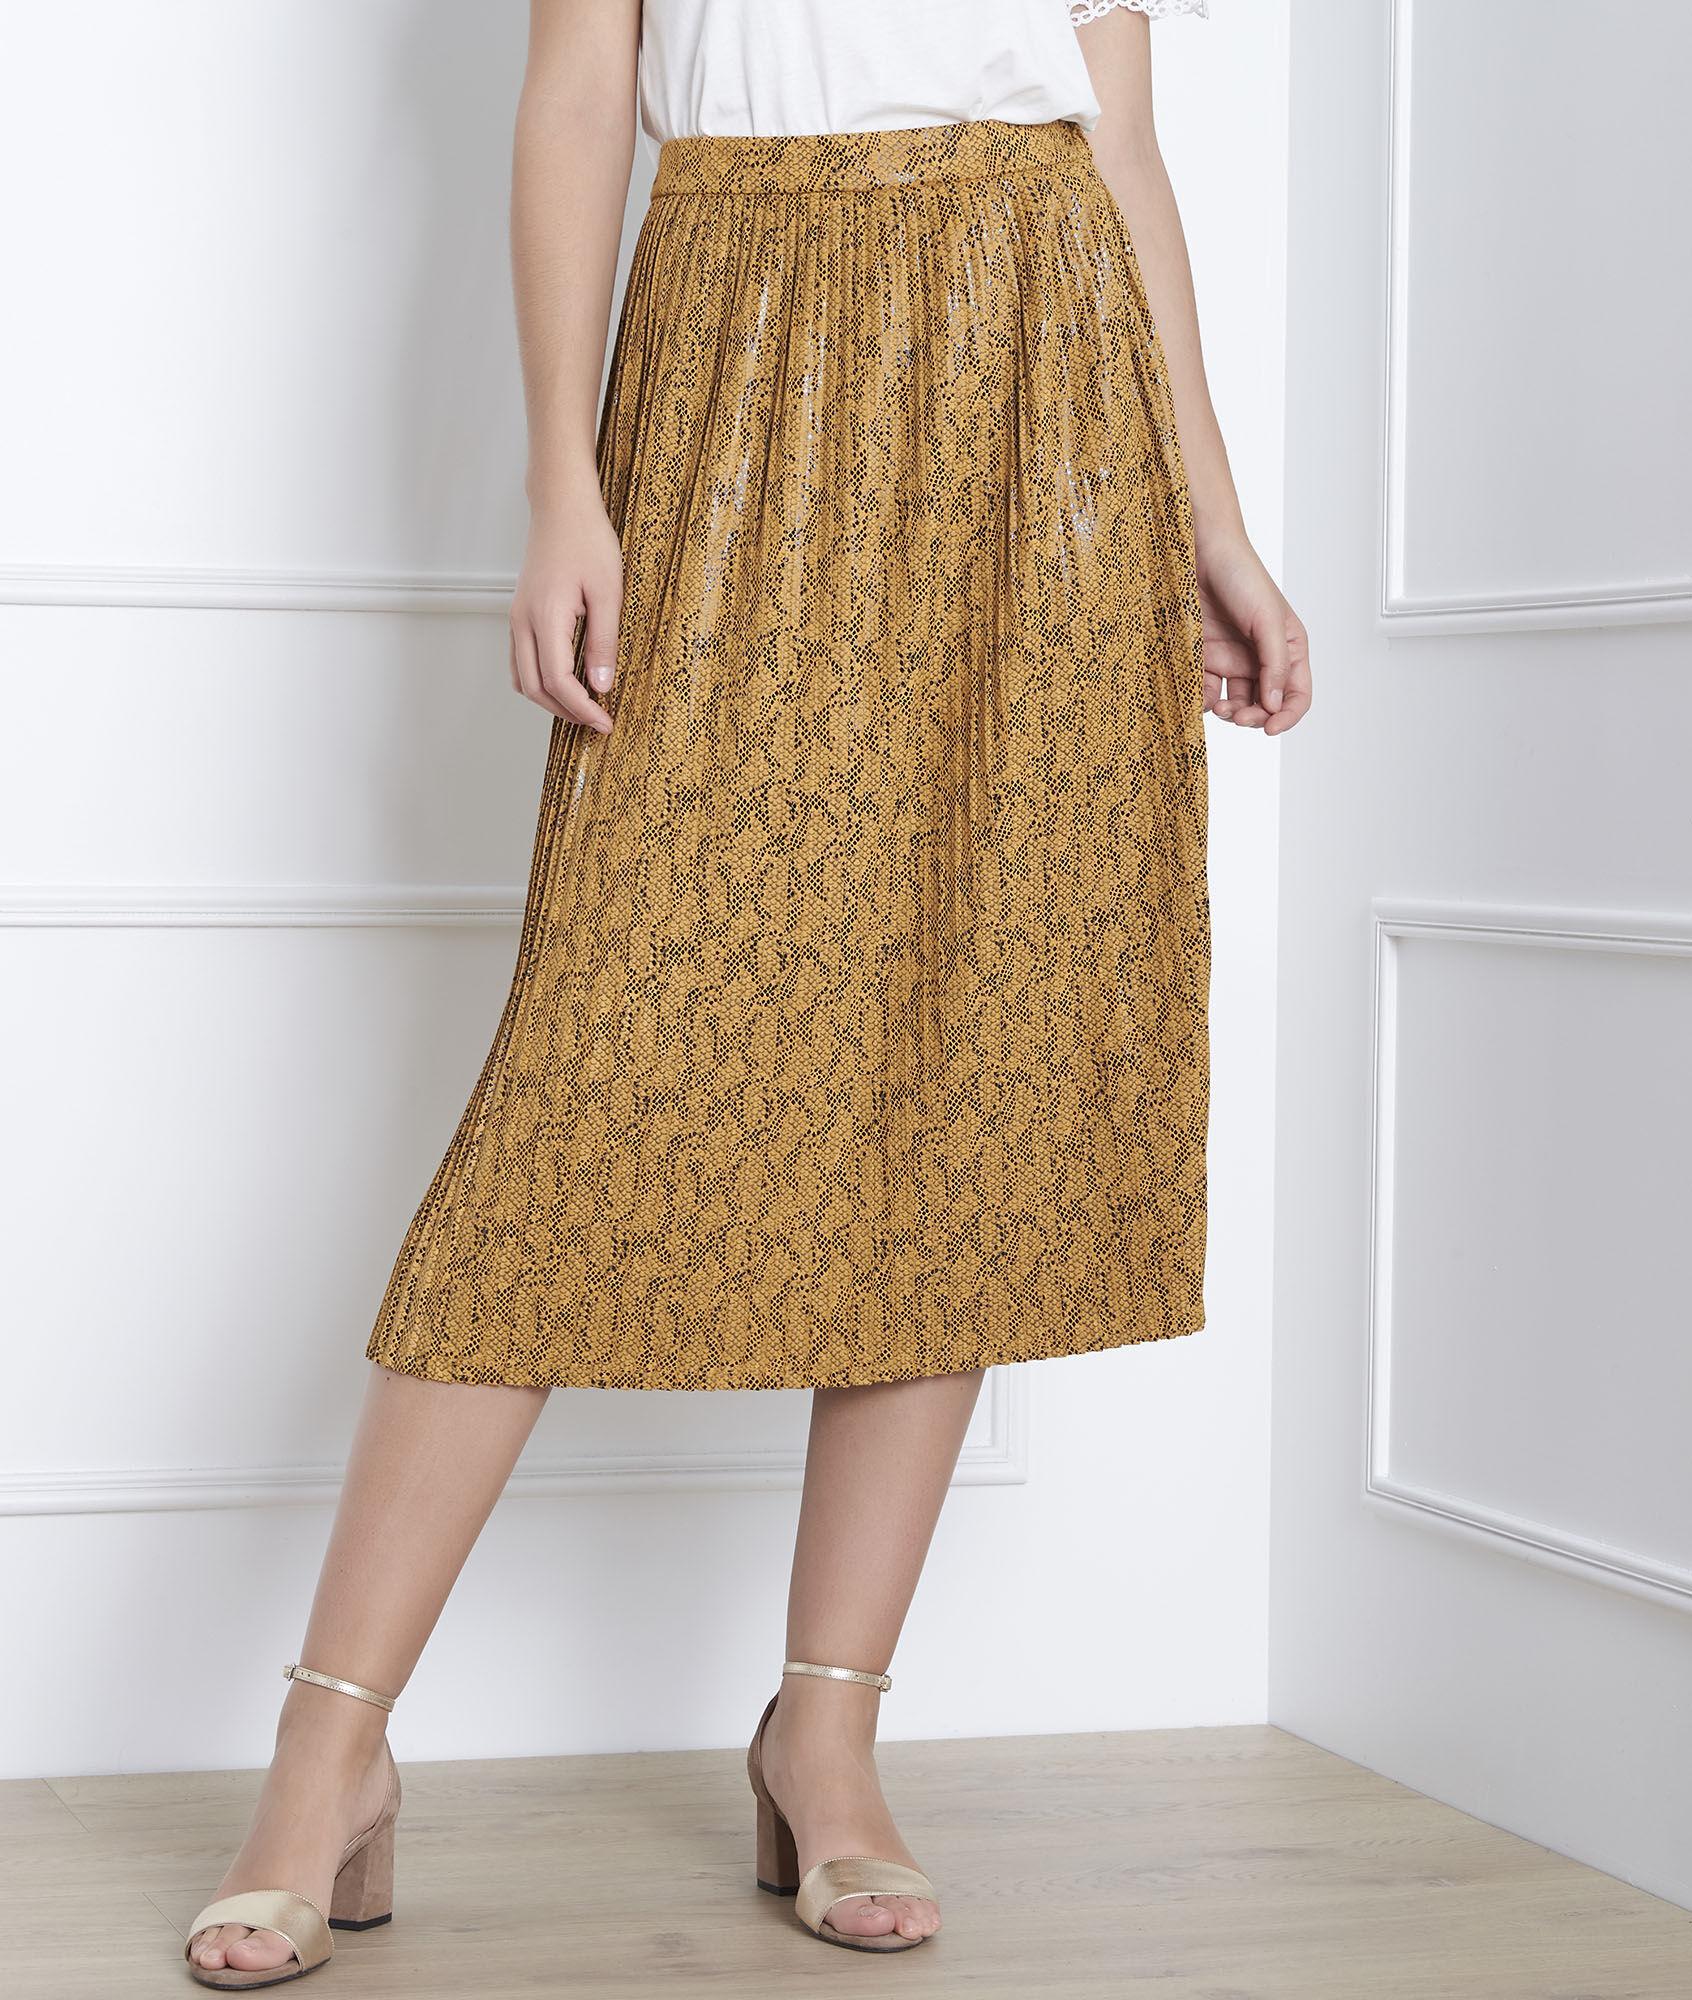 6f177d8e11 Story yellow snakeskin print pleated skirt - Maison Cent Vingt-Trois